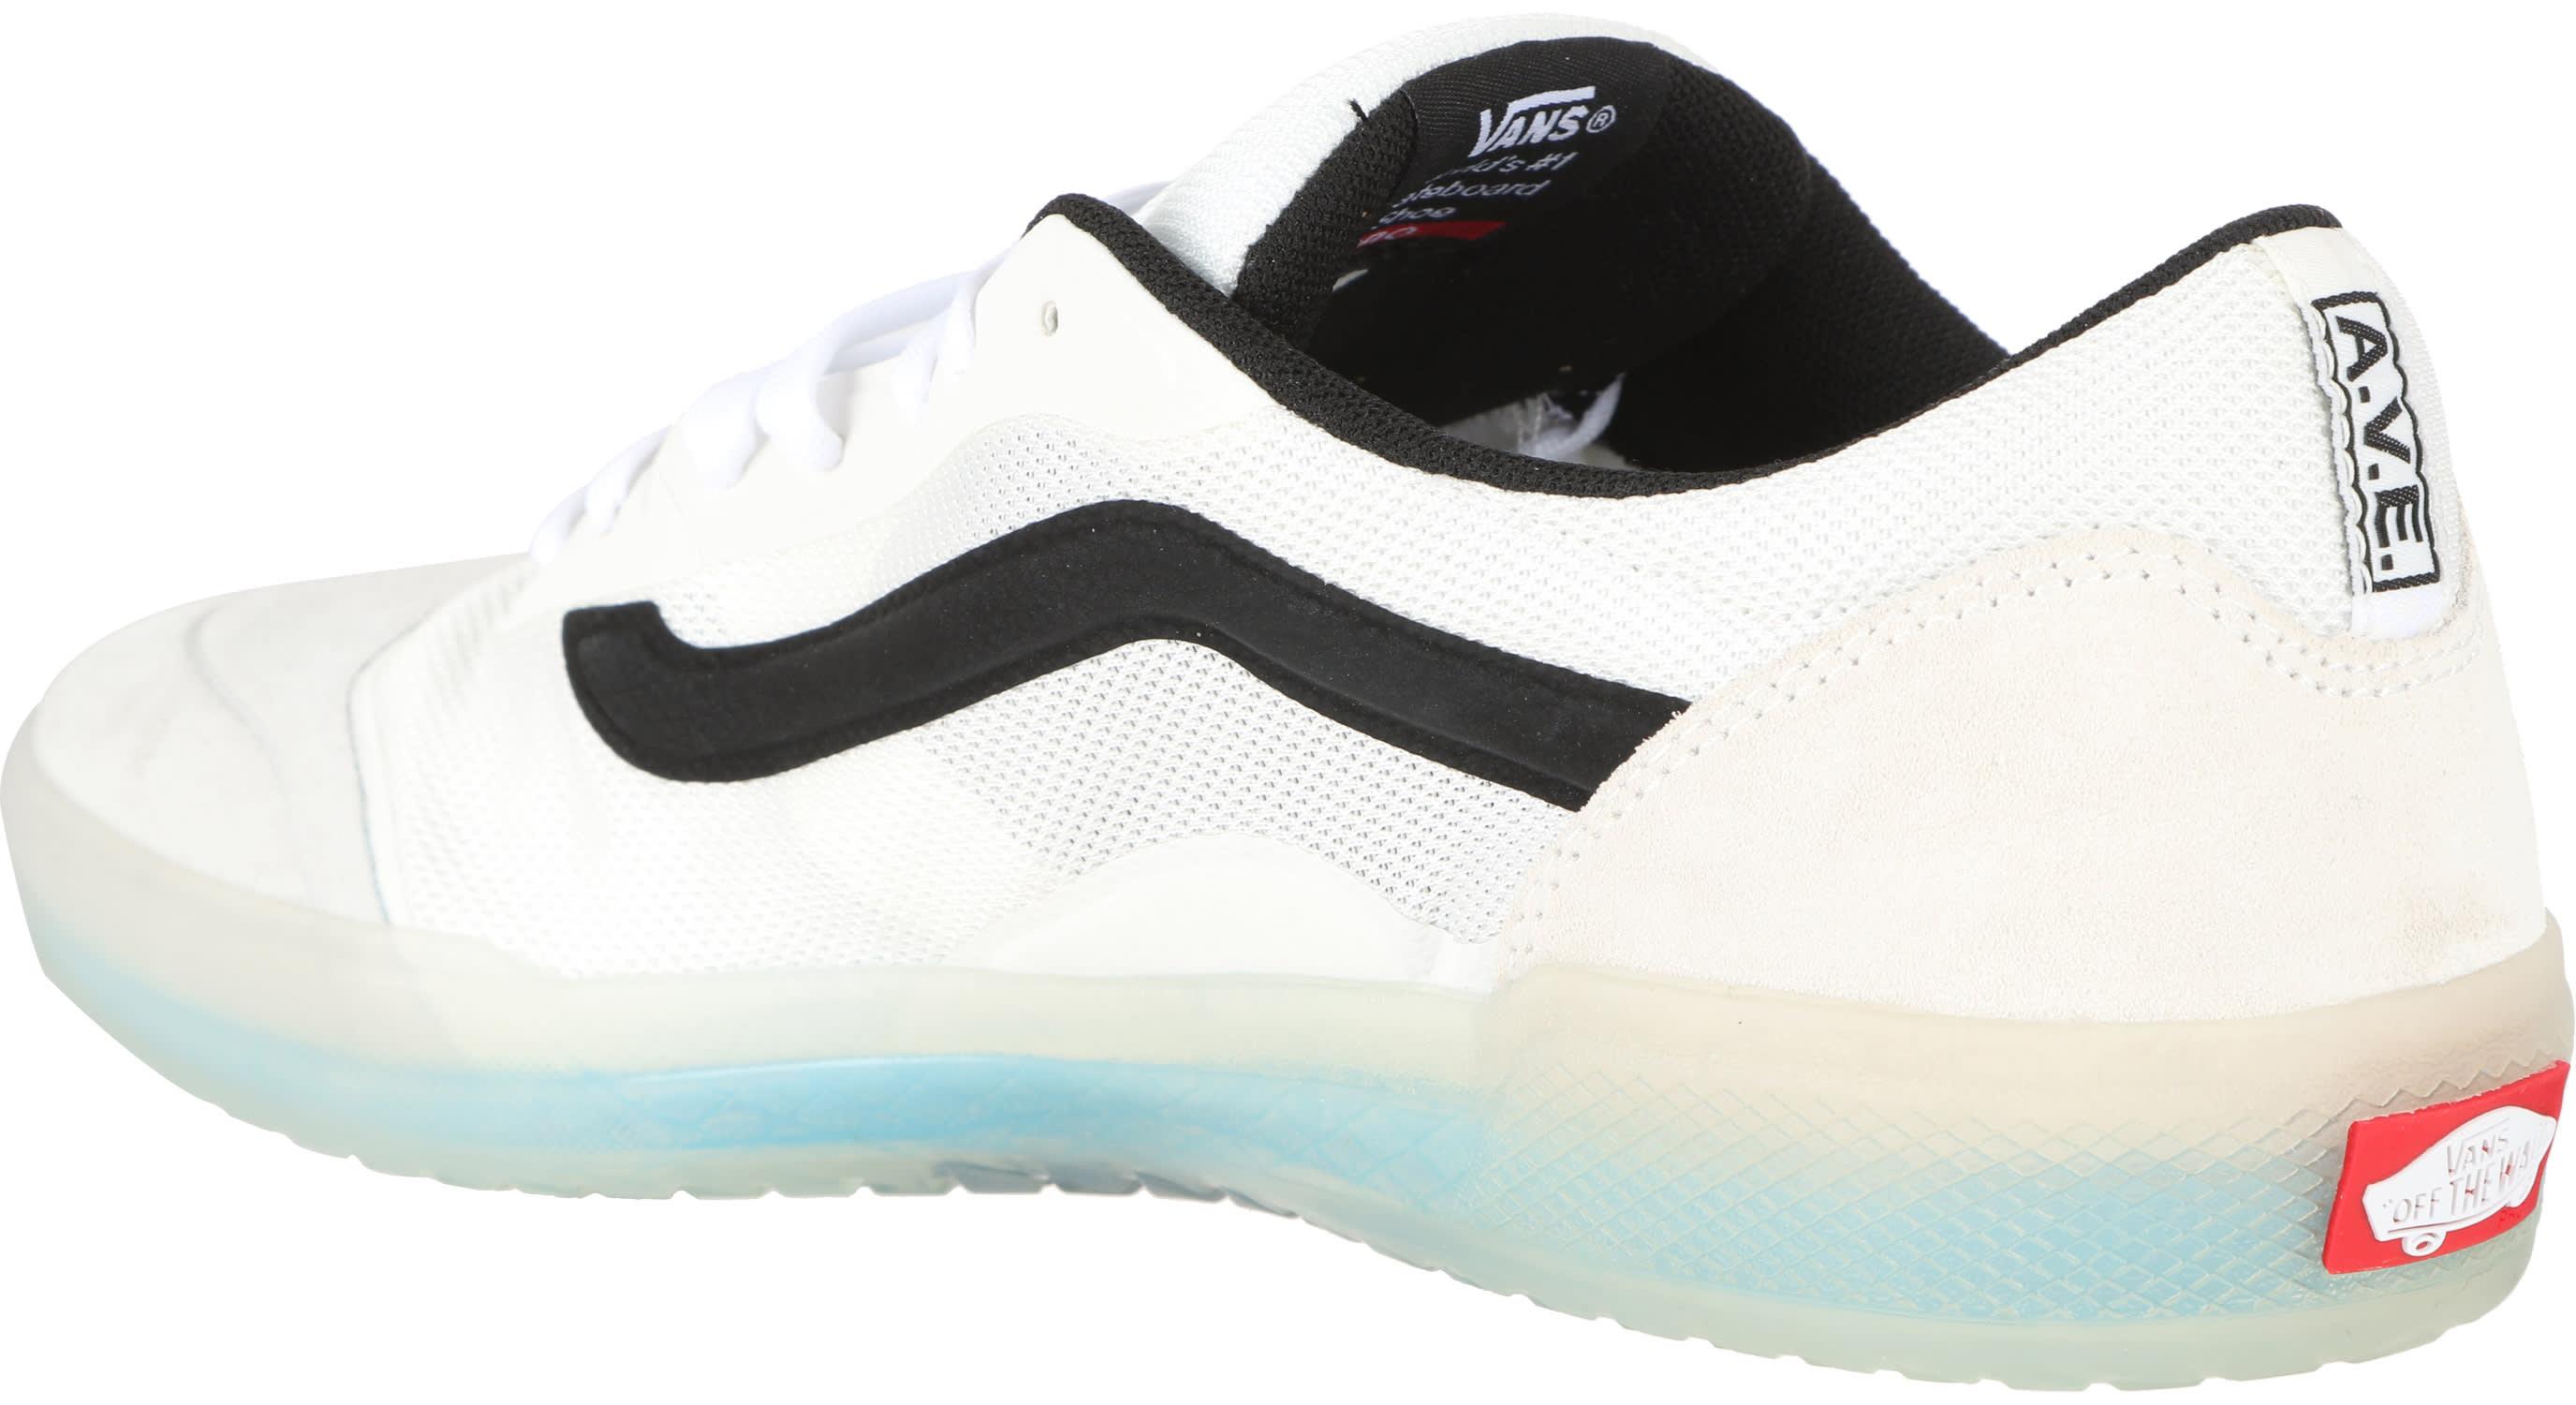 Vans Ave Pro Skate Shoes